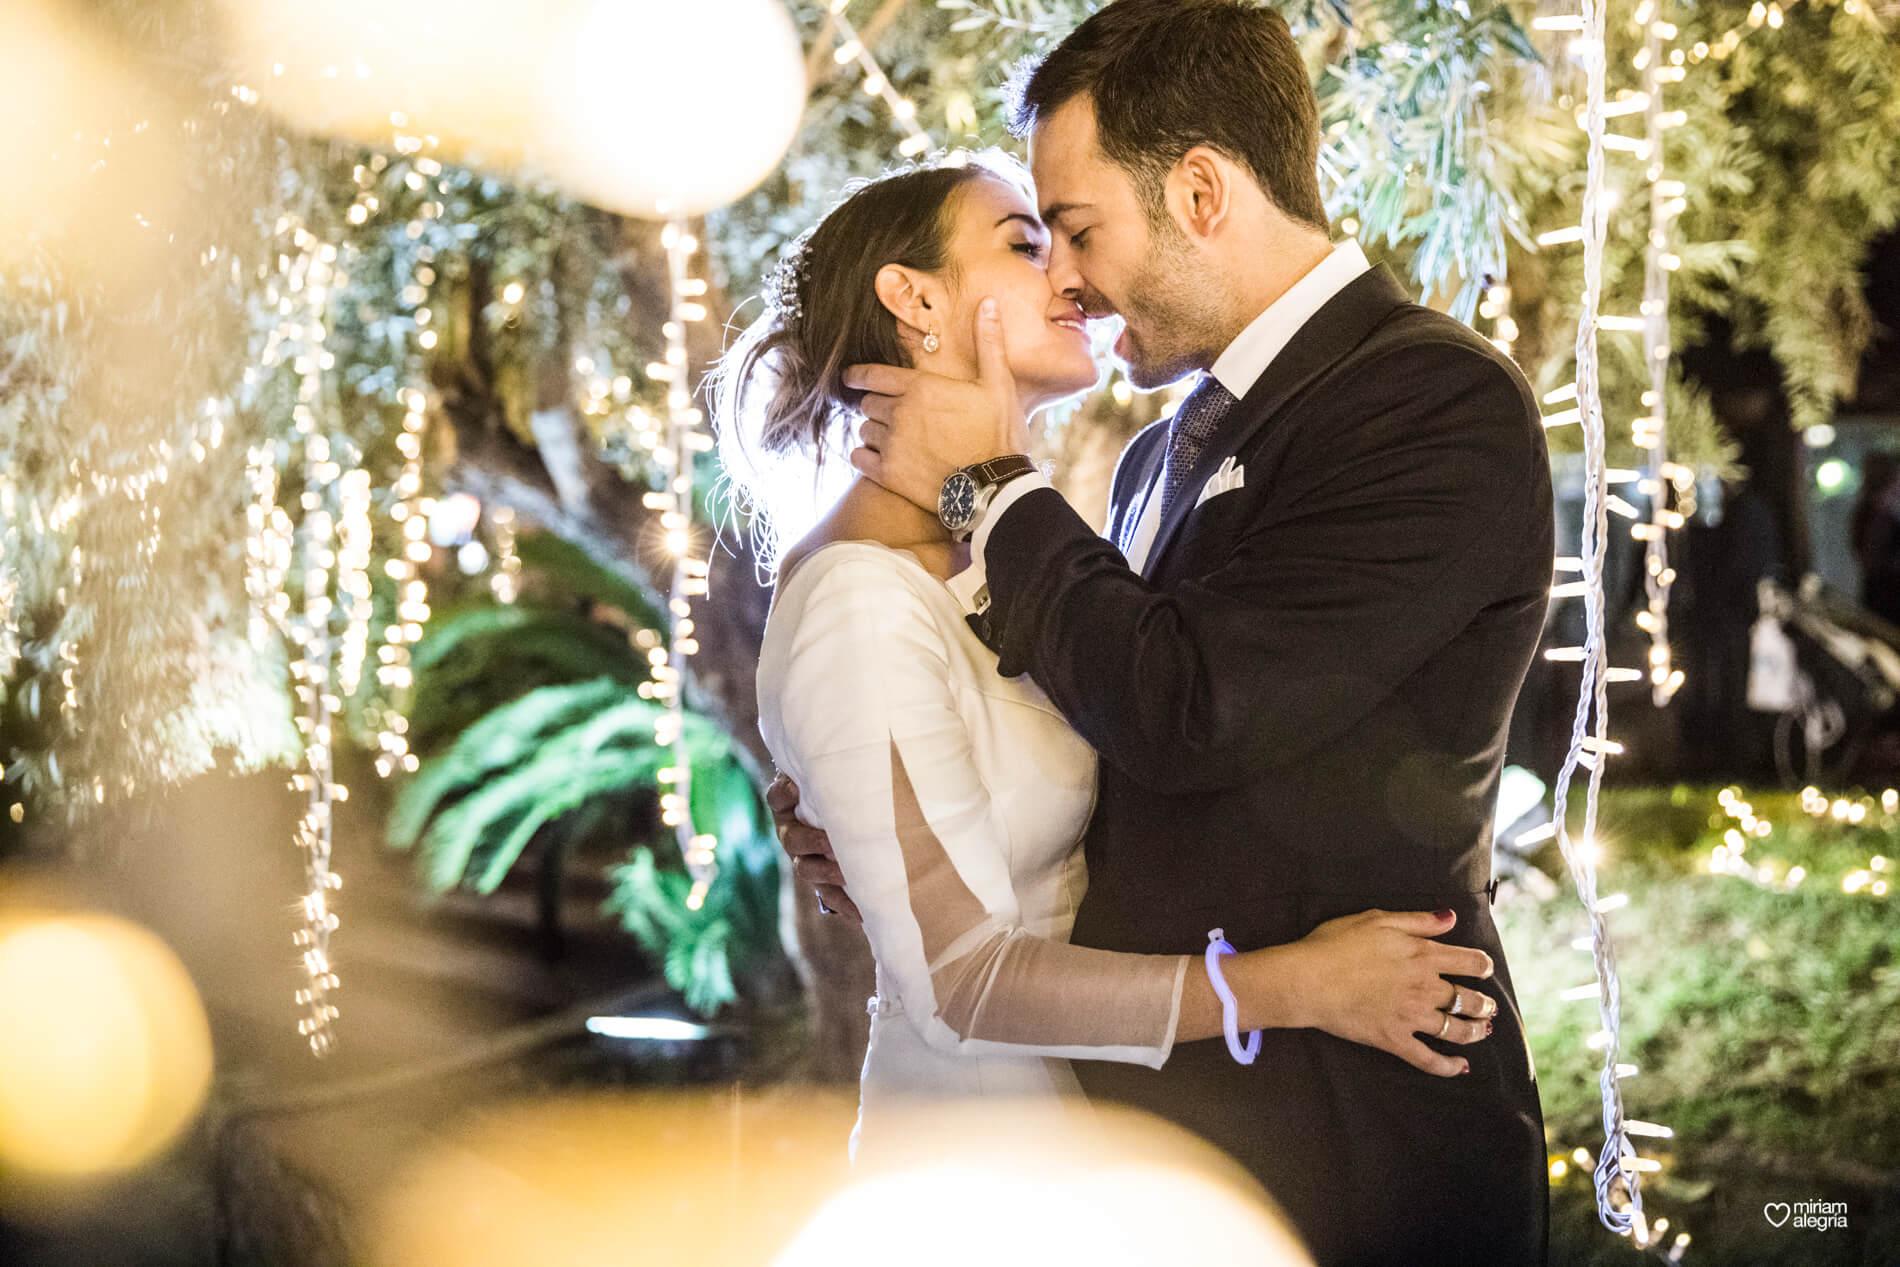 vestido-de-novia-paula-del-vas-miriam-alegria-fotografos-boda-murcia-157